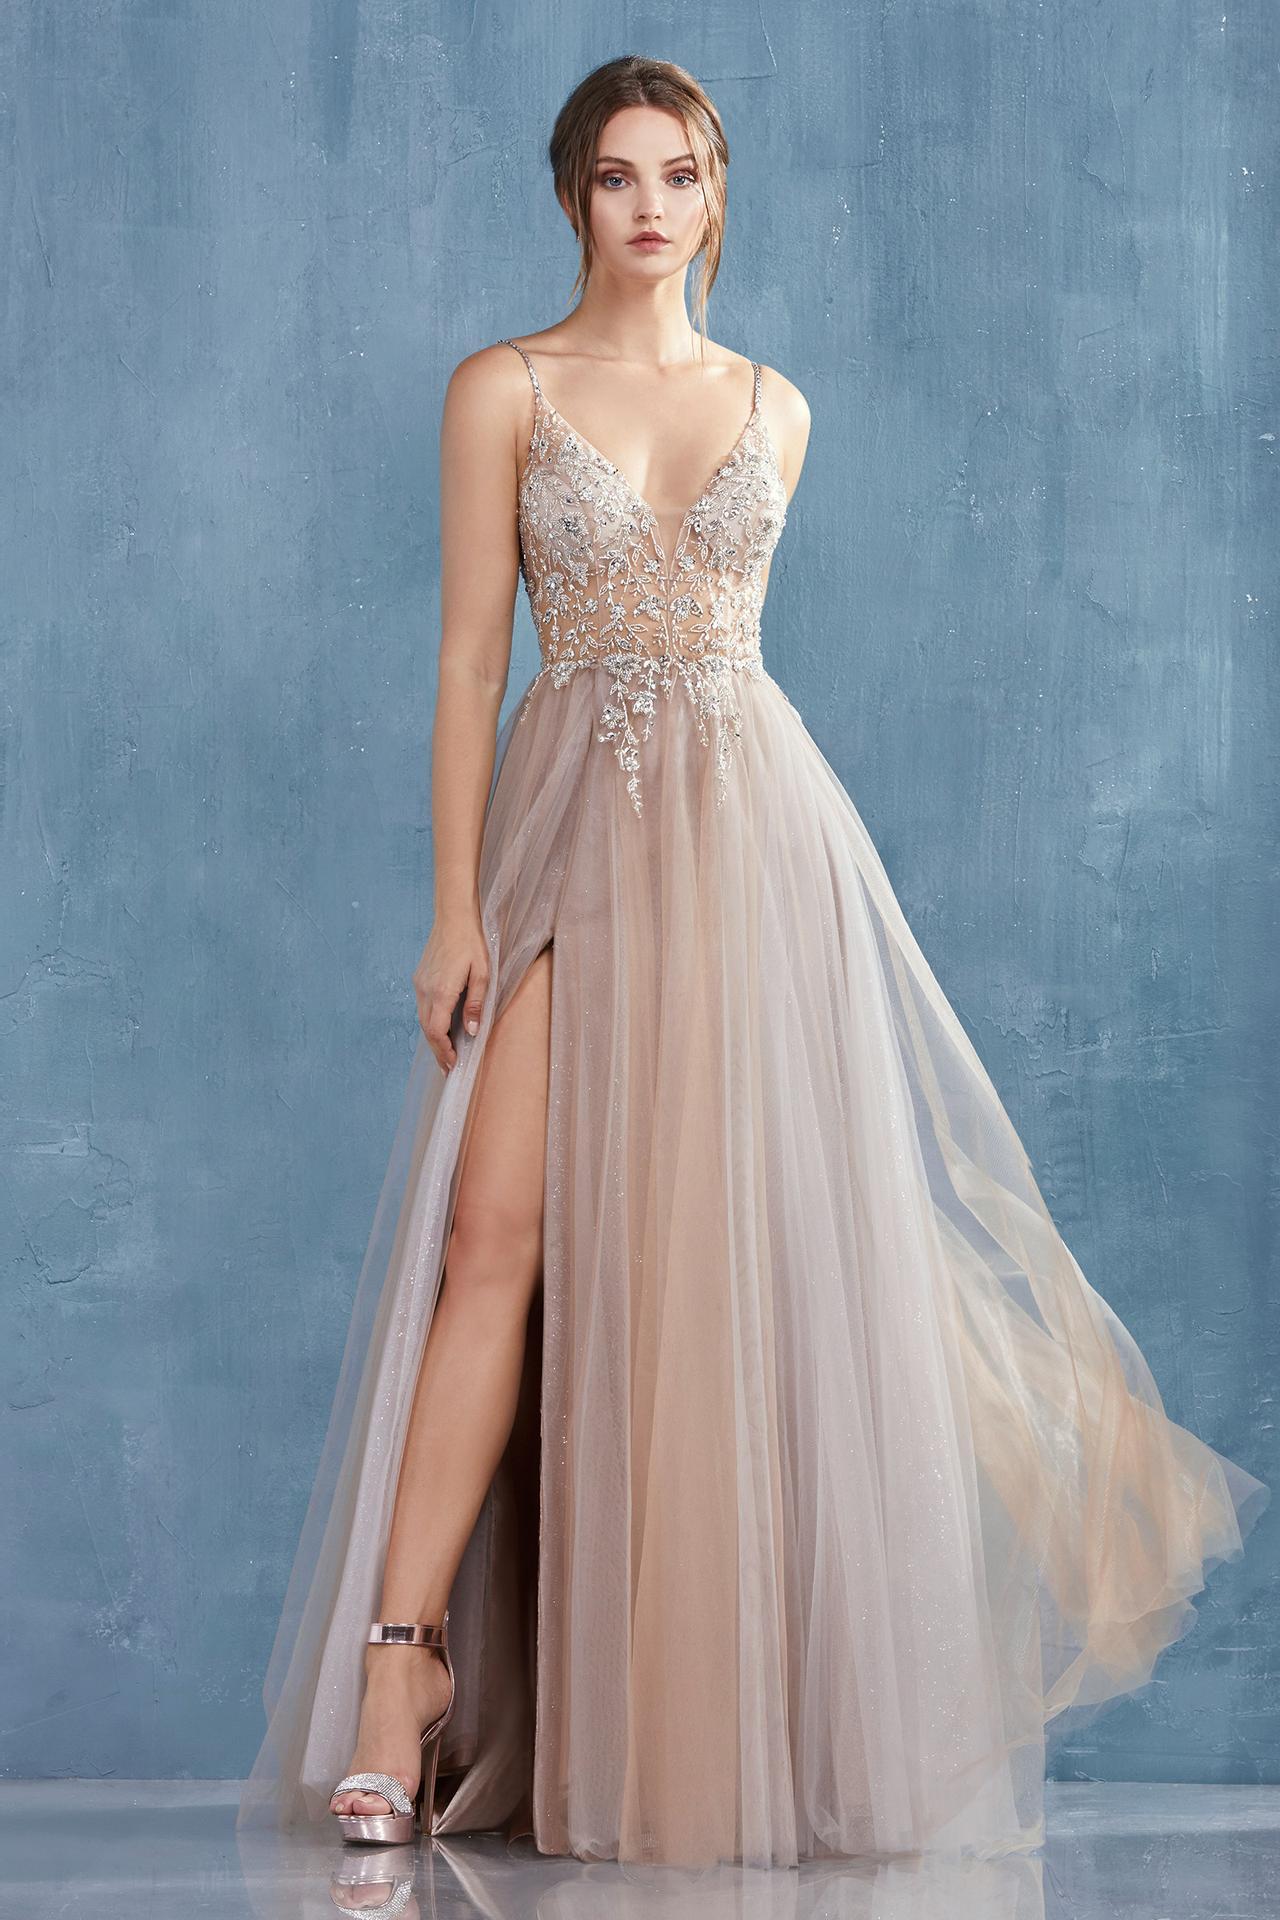 Nové spoločenské šaty :) - Obrázok č. 63